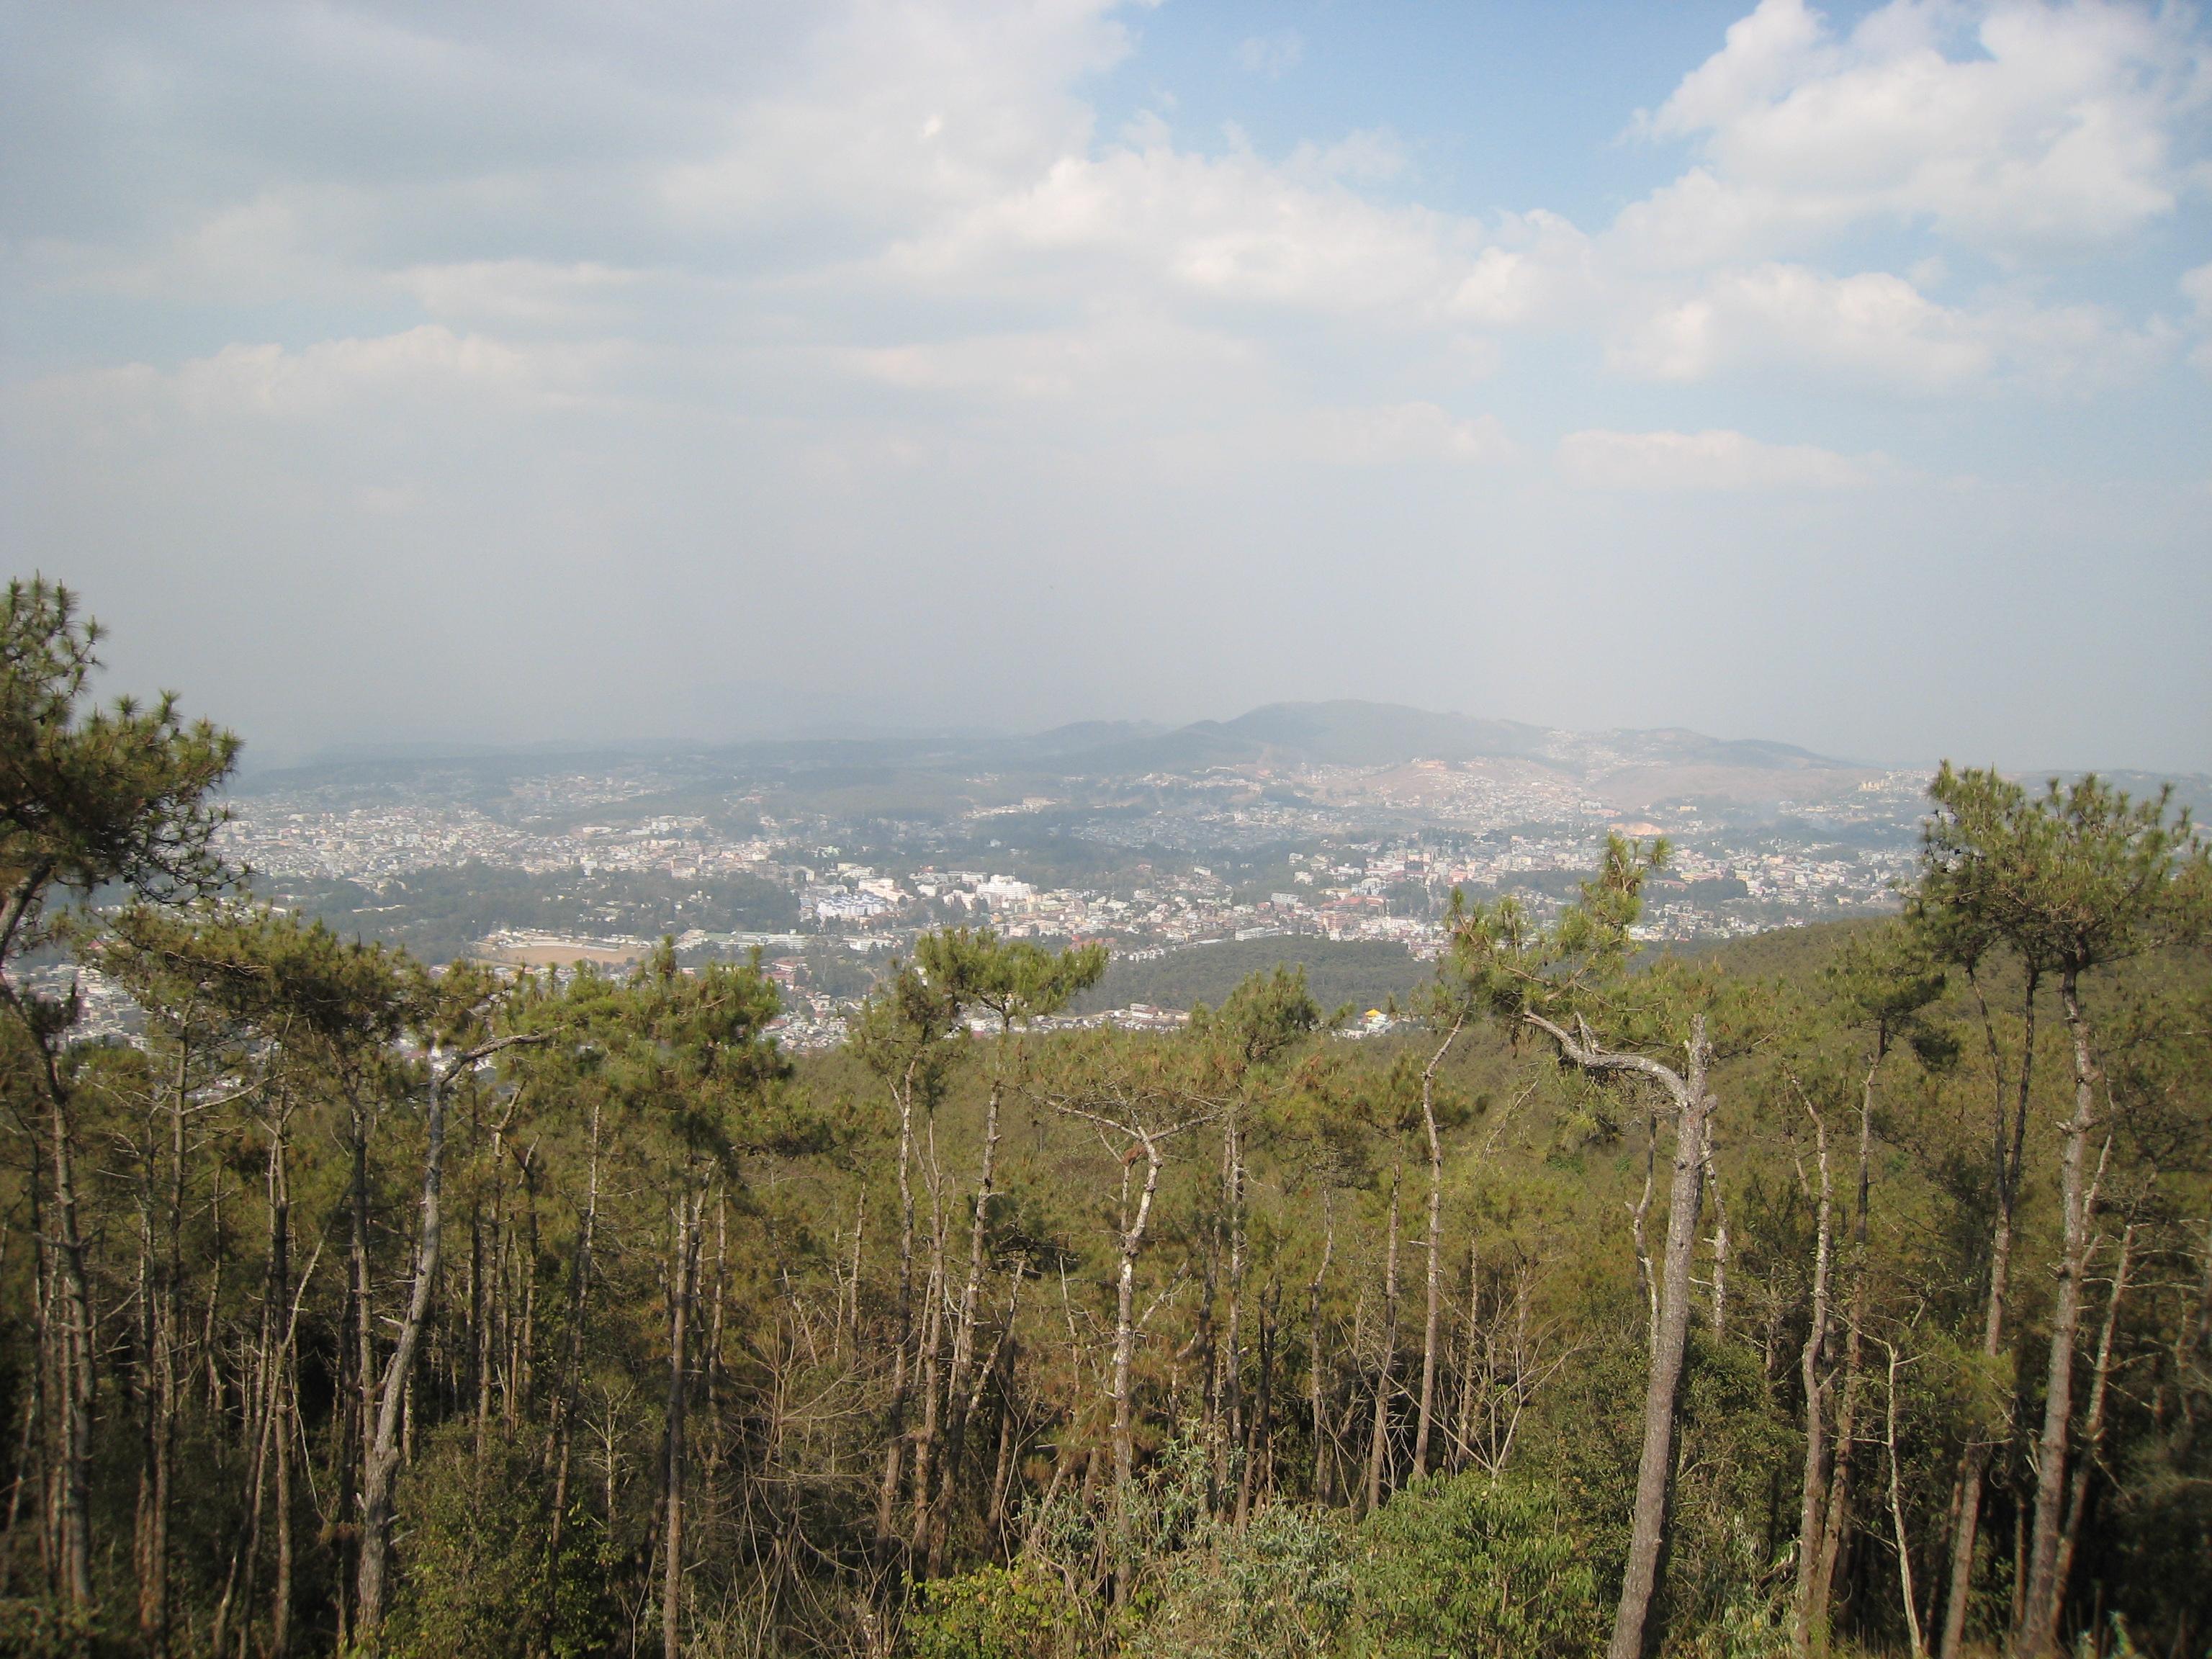 Shillong Landscape from Shillong Peak